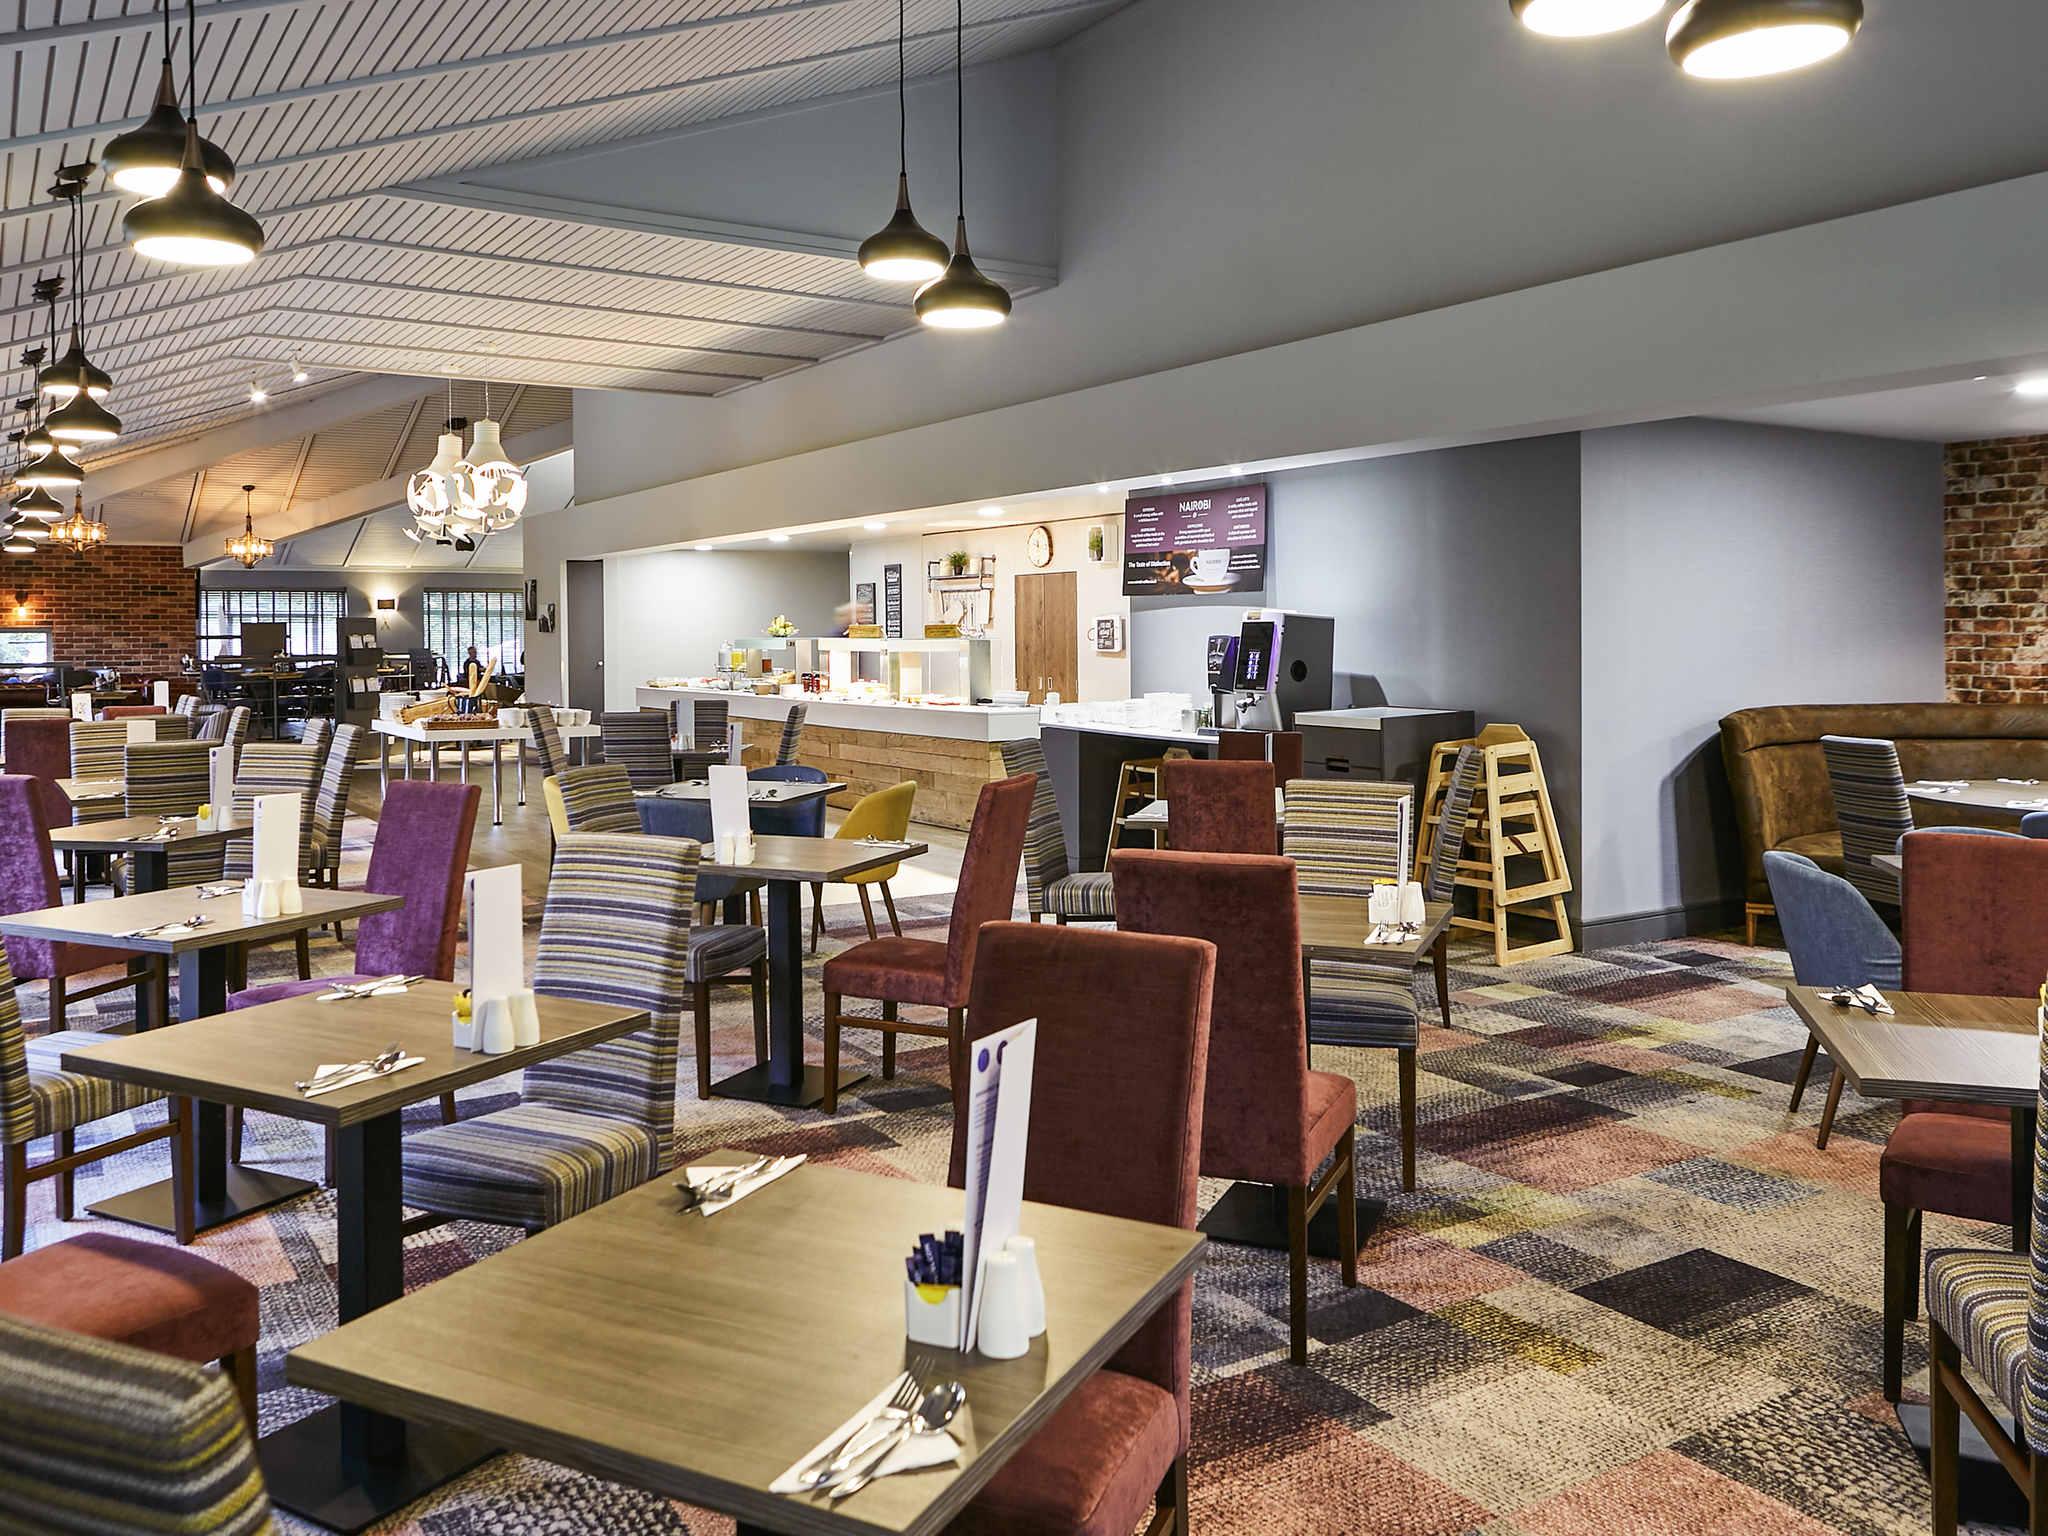 novotel manchester west relaxing hotel in manchester. Black Bedroom Furniture Sets. Home Design Ideas